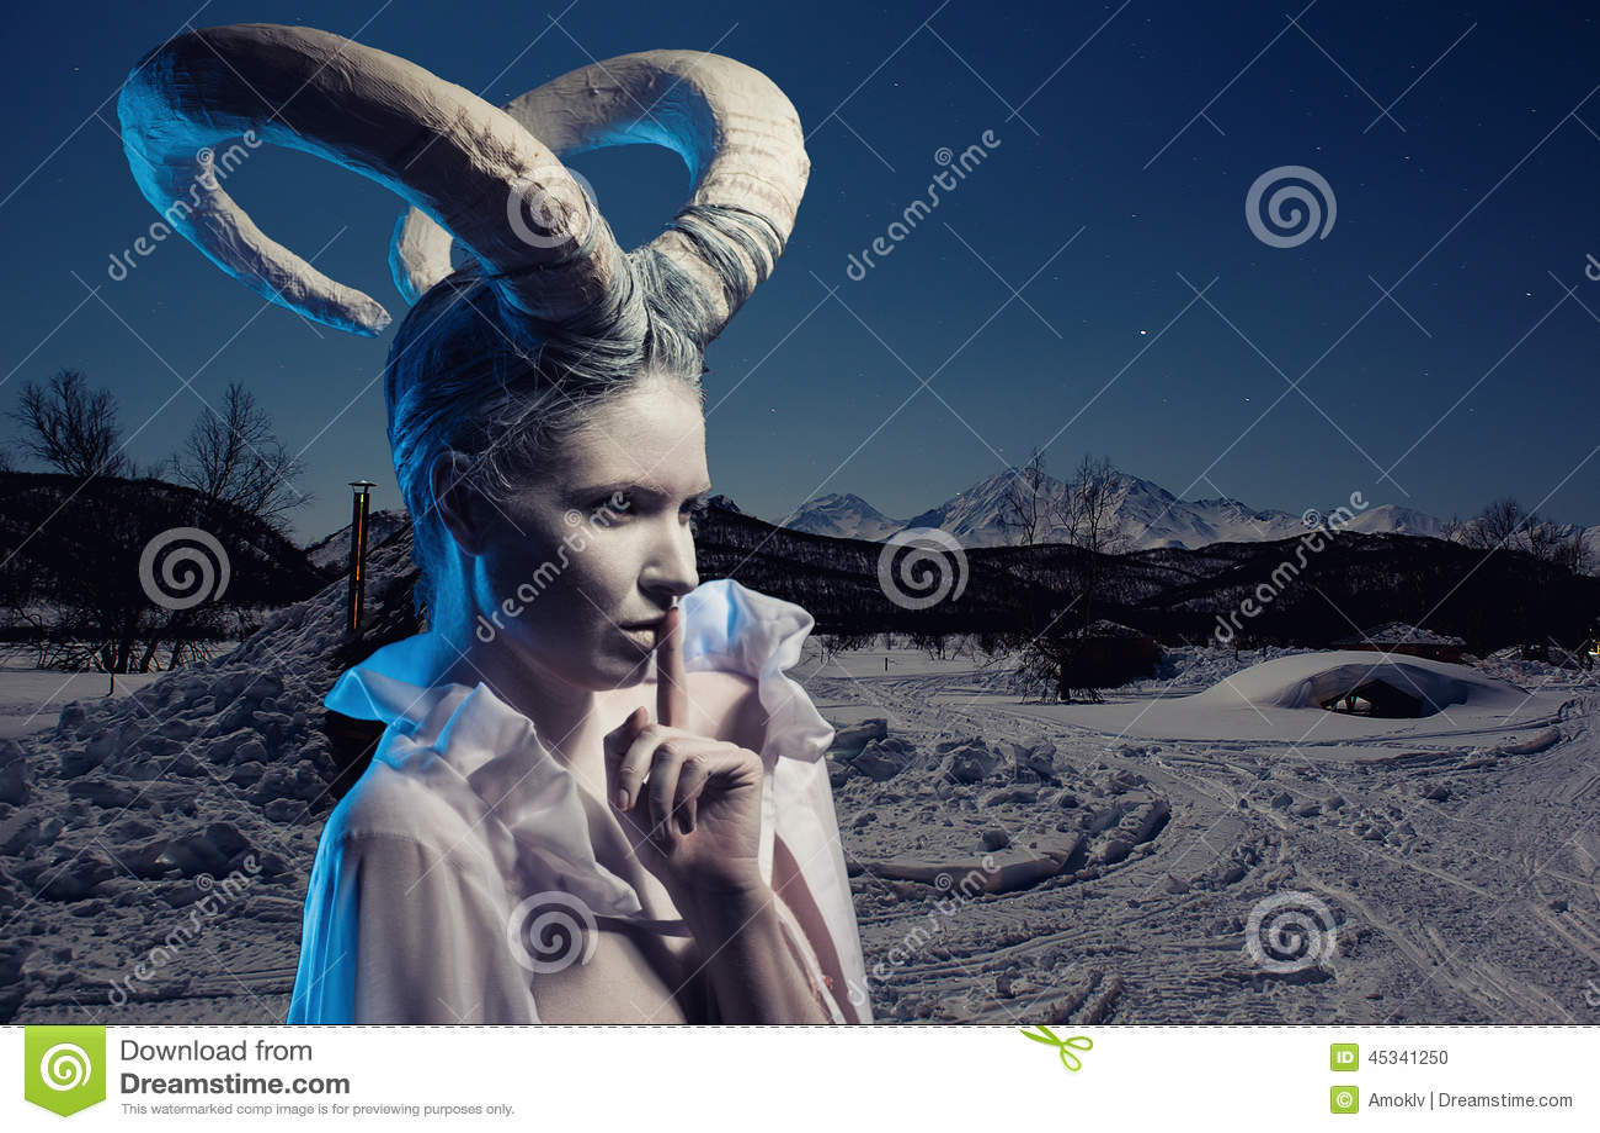 Фото жена с рогами 16 фотография